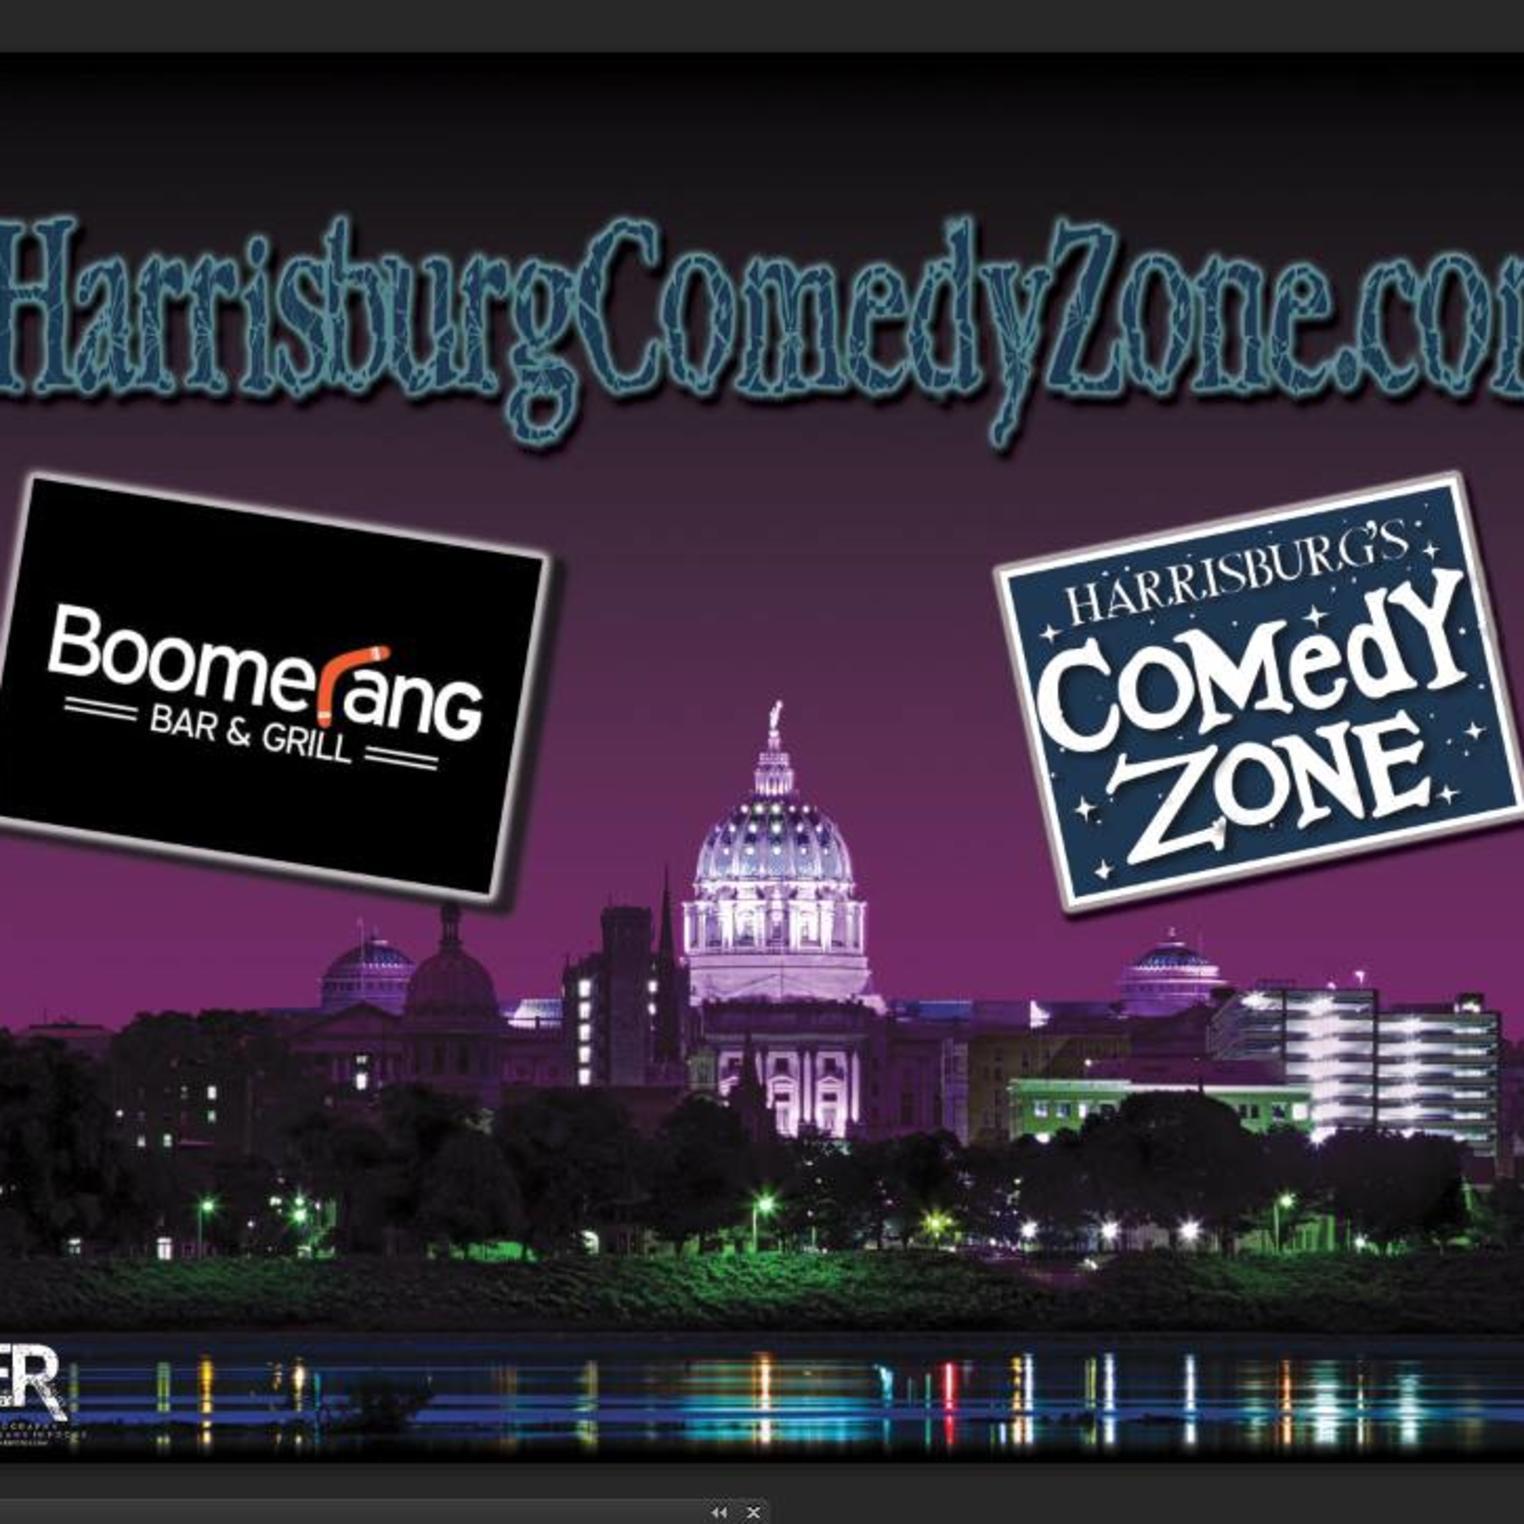 Harrisburg Comedy Zone